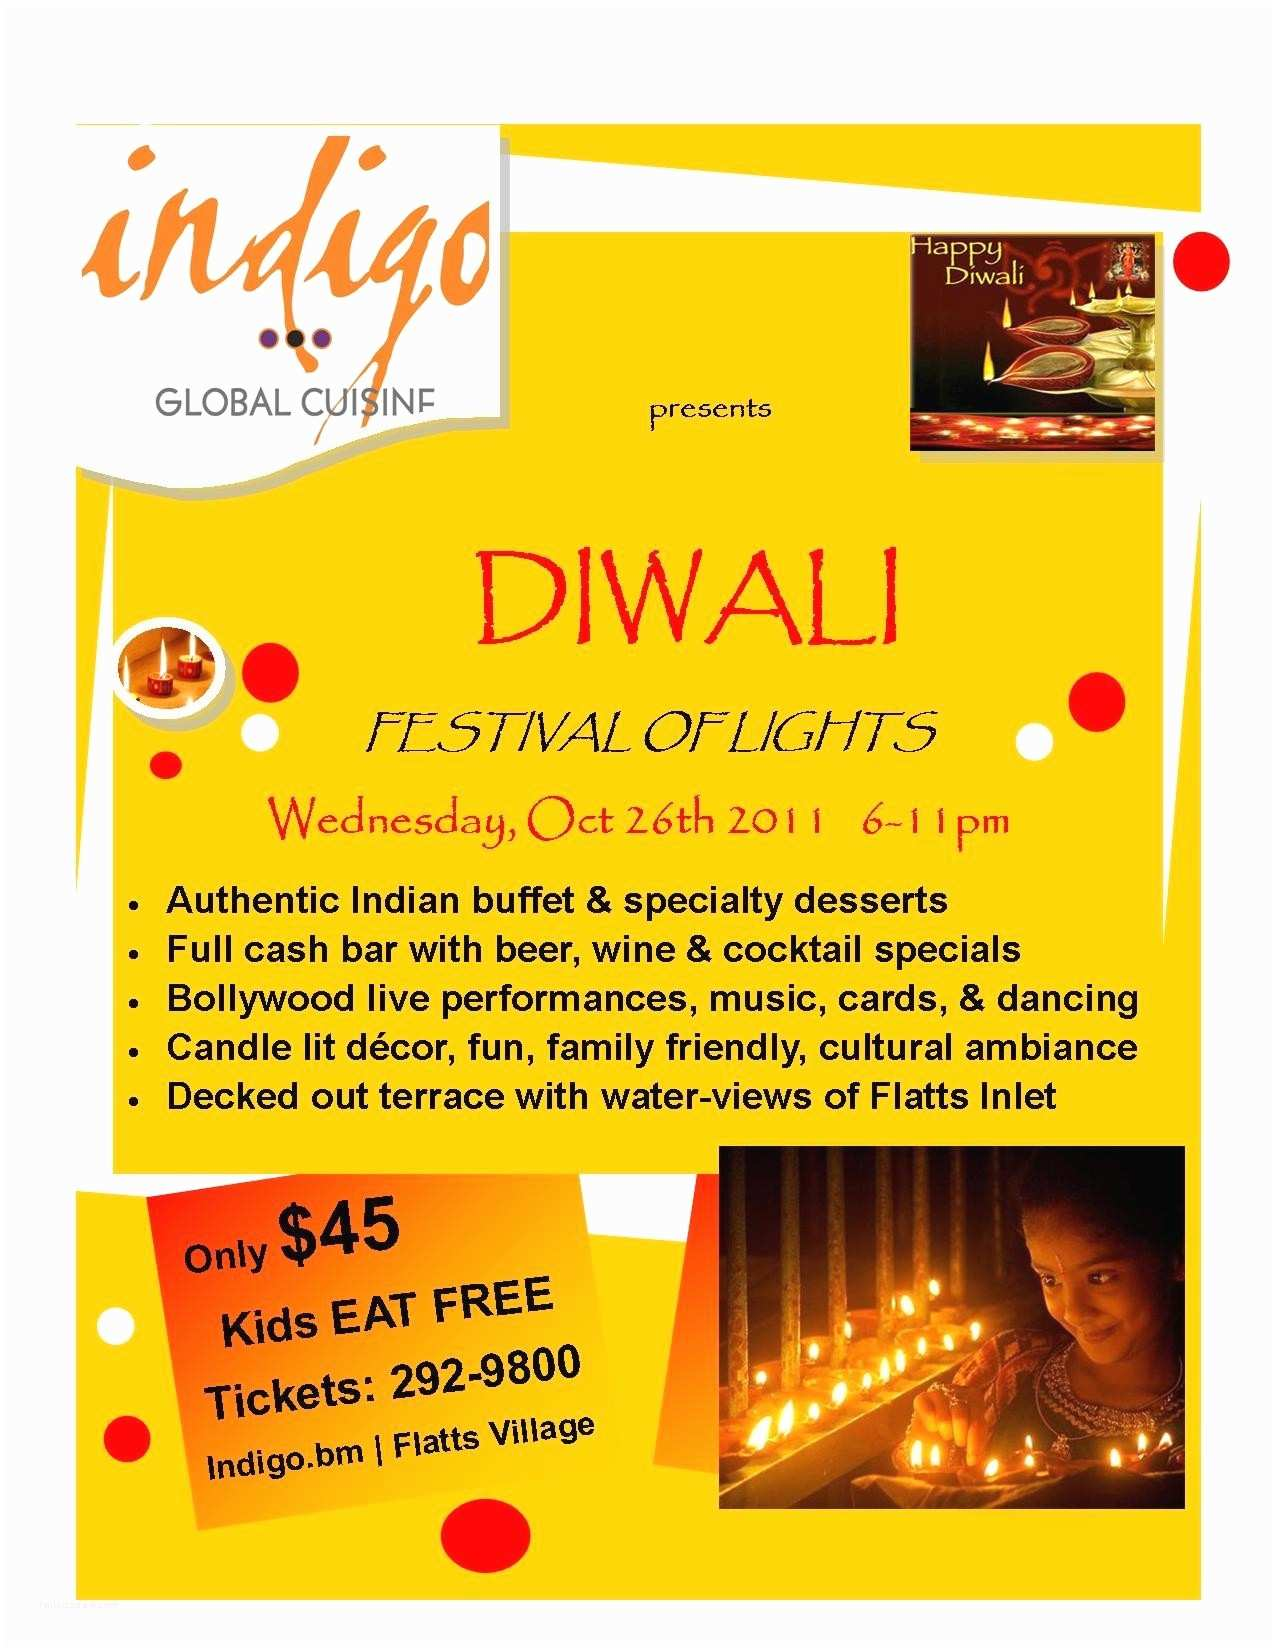 Diwali Party Invitation Sample Invitation for Diwali Party Gallery Invitation